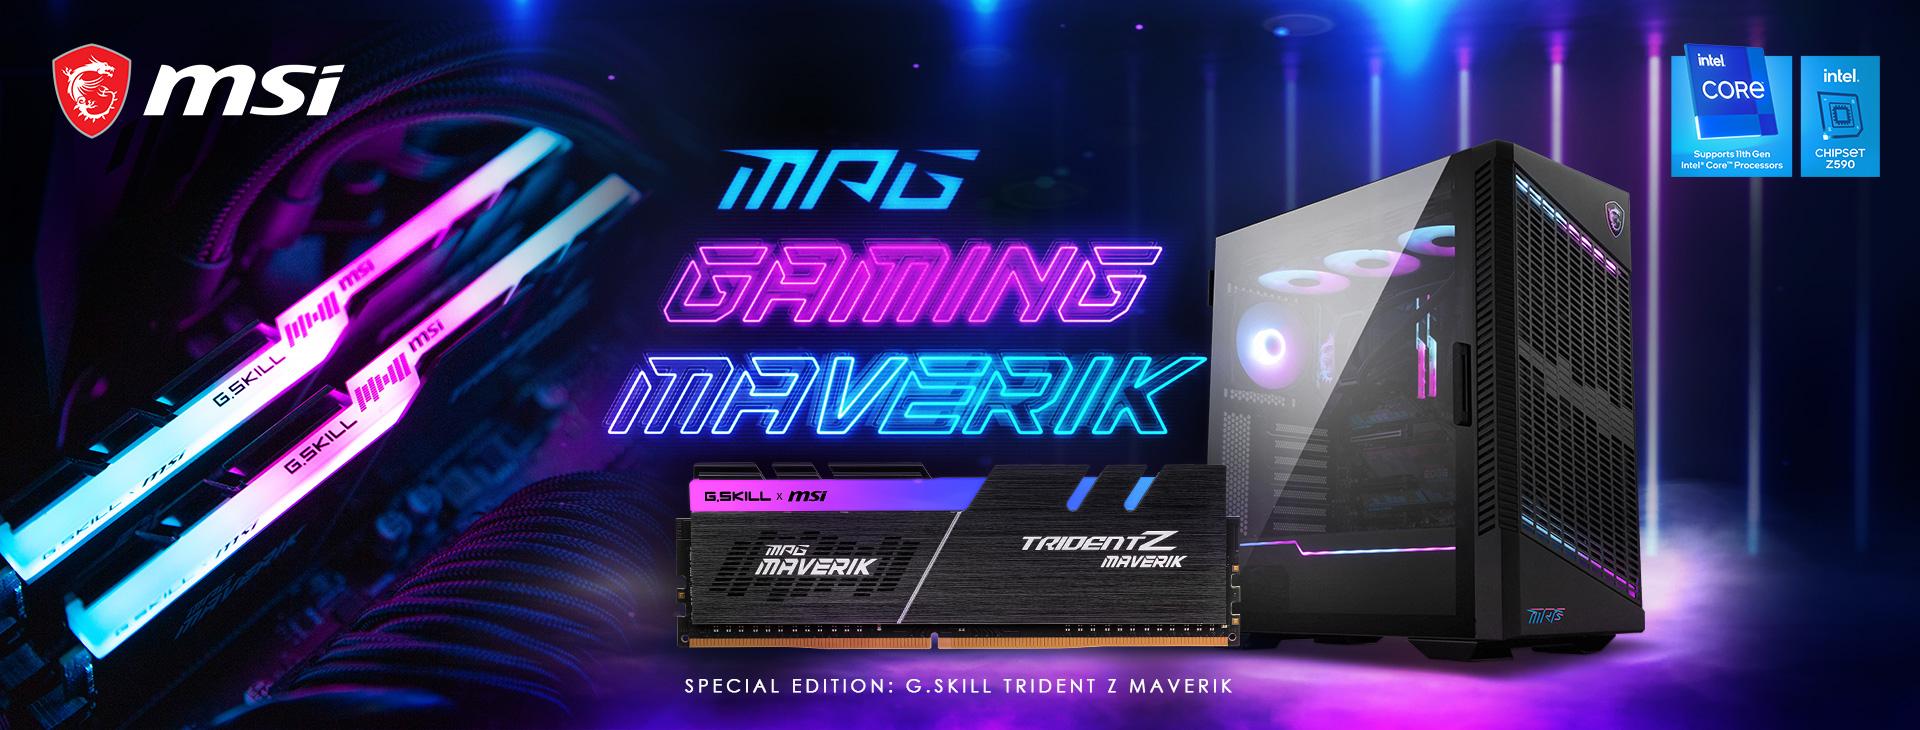 03 trident z maverik msi mpg gaming maverik bundle G.SKILL เปิดตัวแรม Trident Z Maverik DDR4 รุ่นใหม่ที่มาพร้อมกับชุดเมนบอร์ด MSI MPG GAMING MAVERIK รุ่นใหม่ล่าสุด